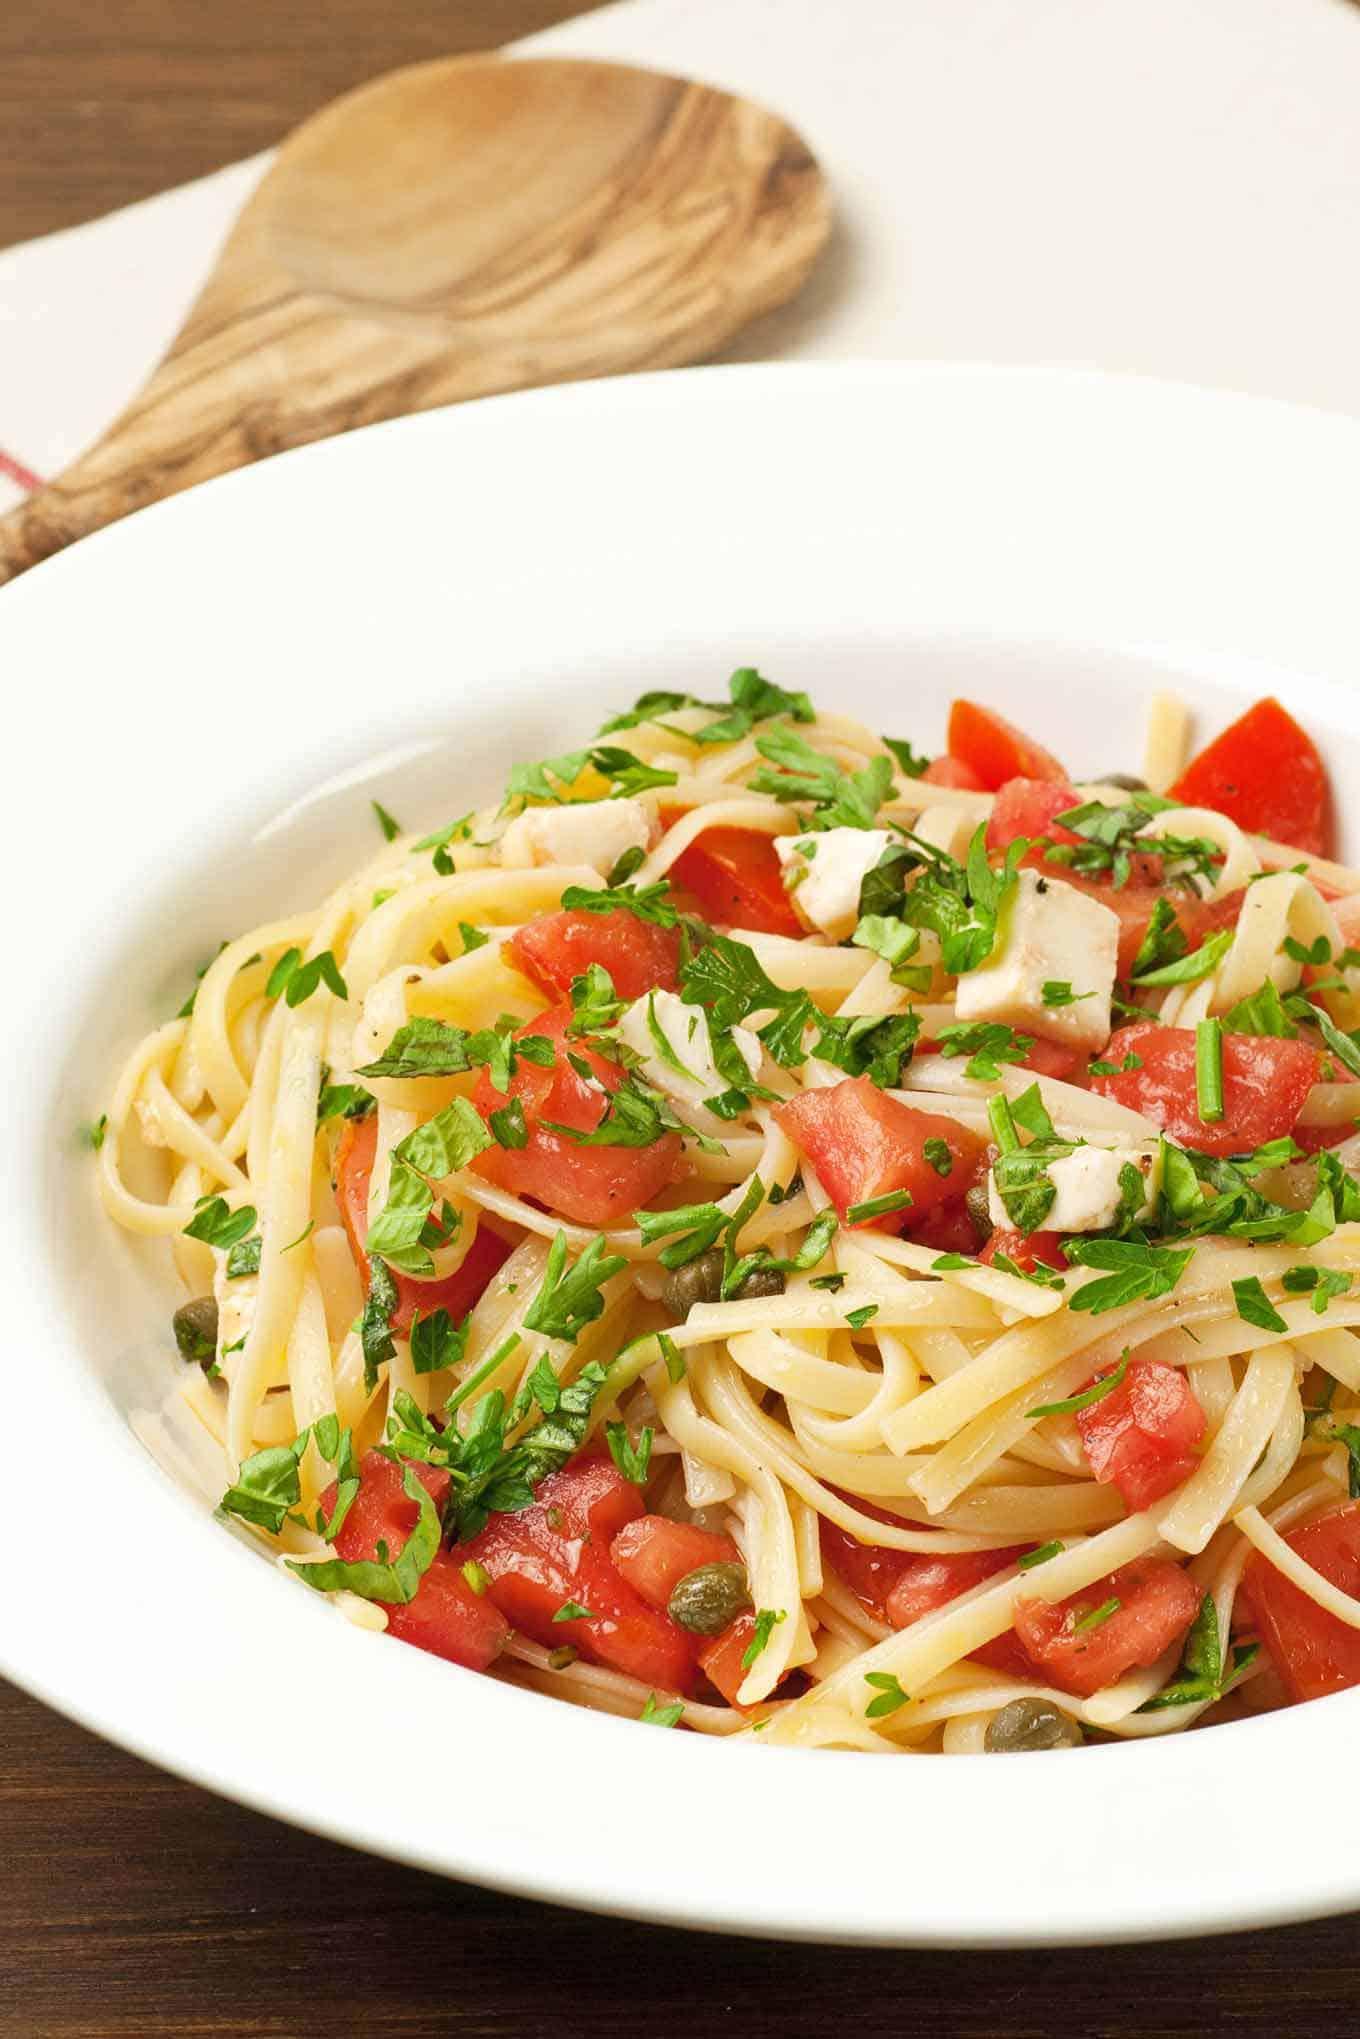 Pasta with Fresh Tomatoes, Herbs and Mozzarella